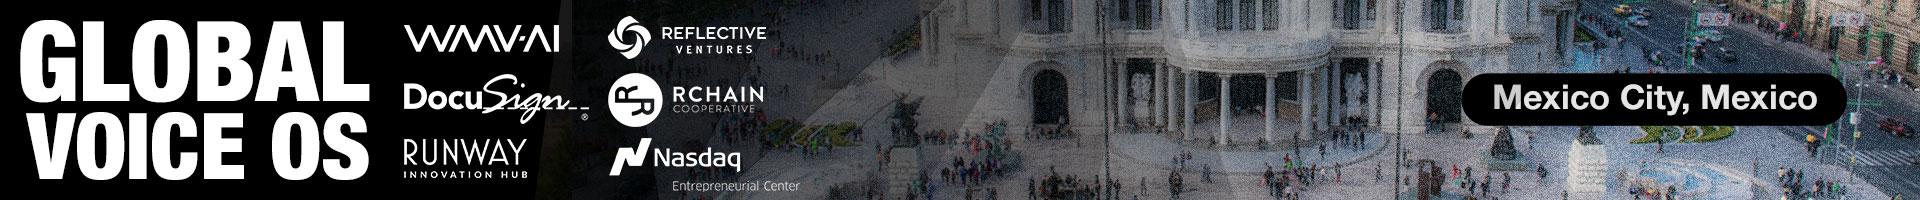 Event-Global-Voice-OS-1920x200-Mexico-City-Mexico